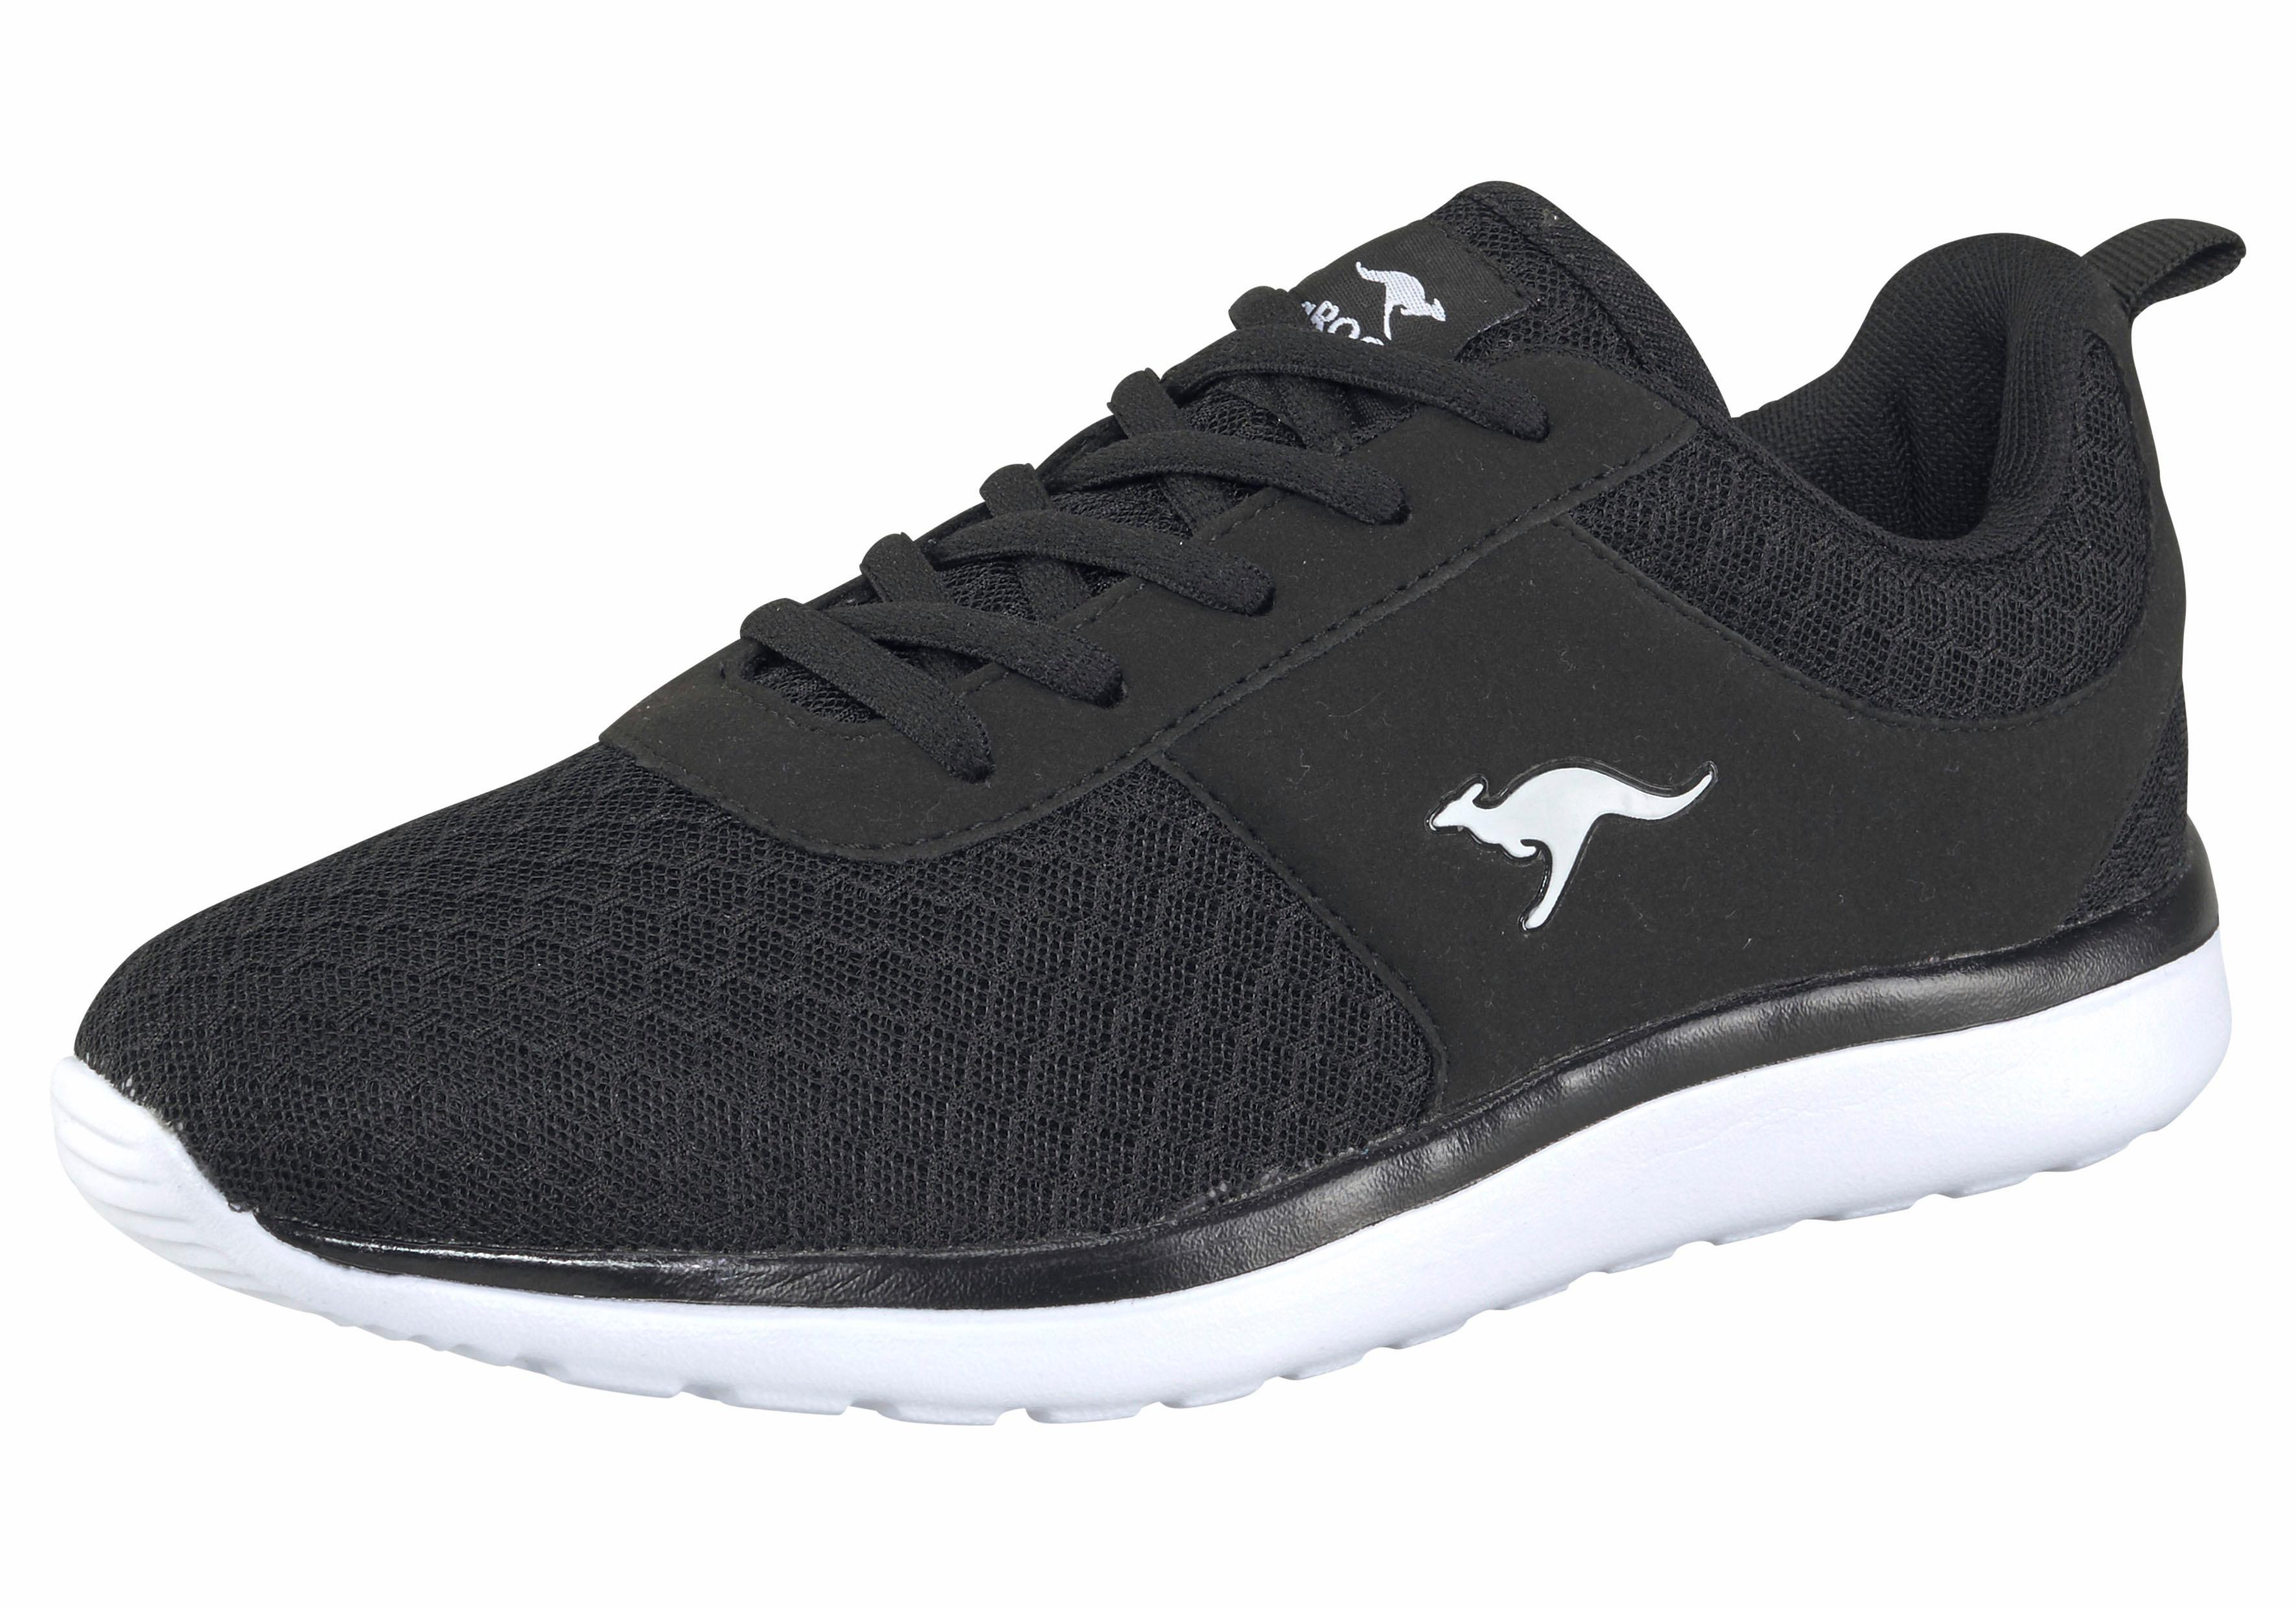 KangaROOS Sneaker Bumpy